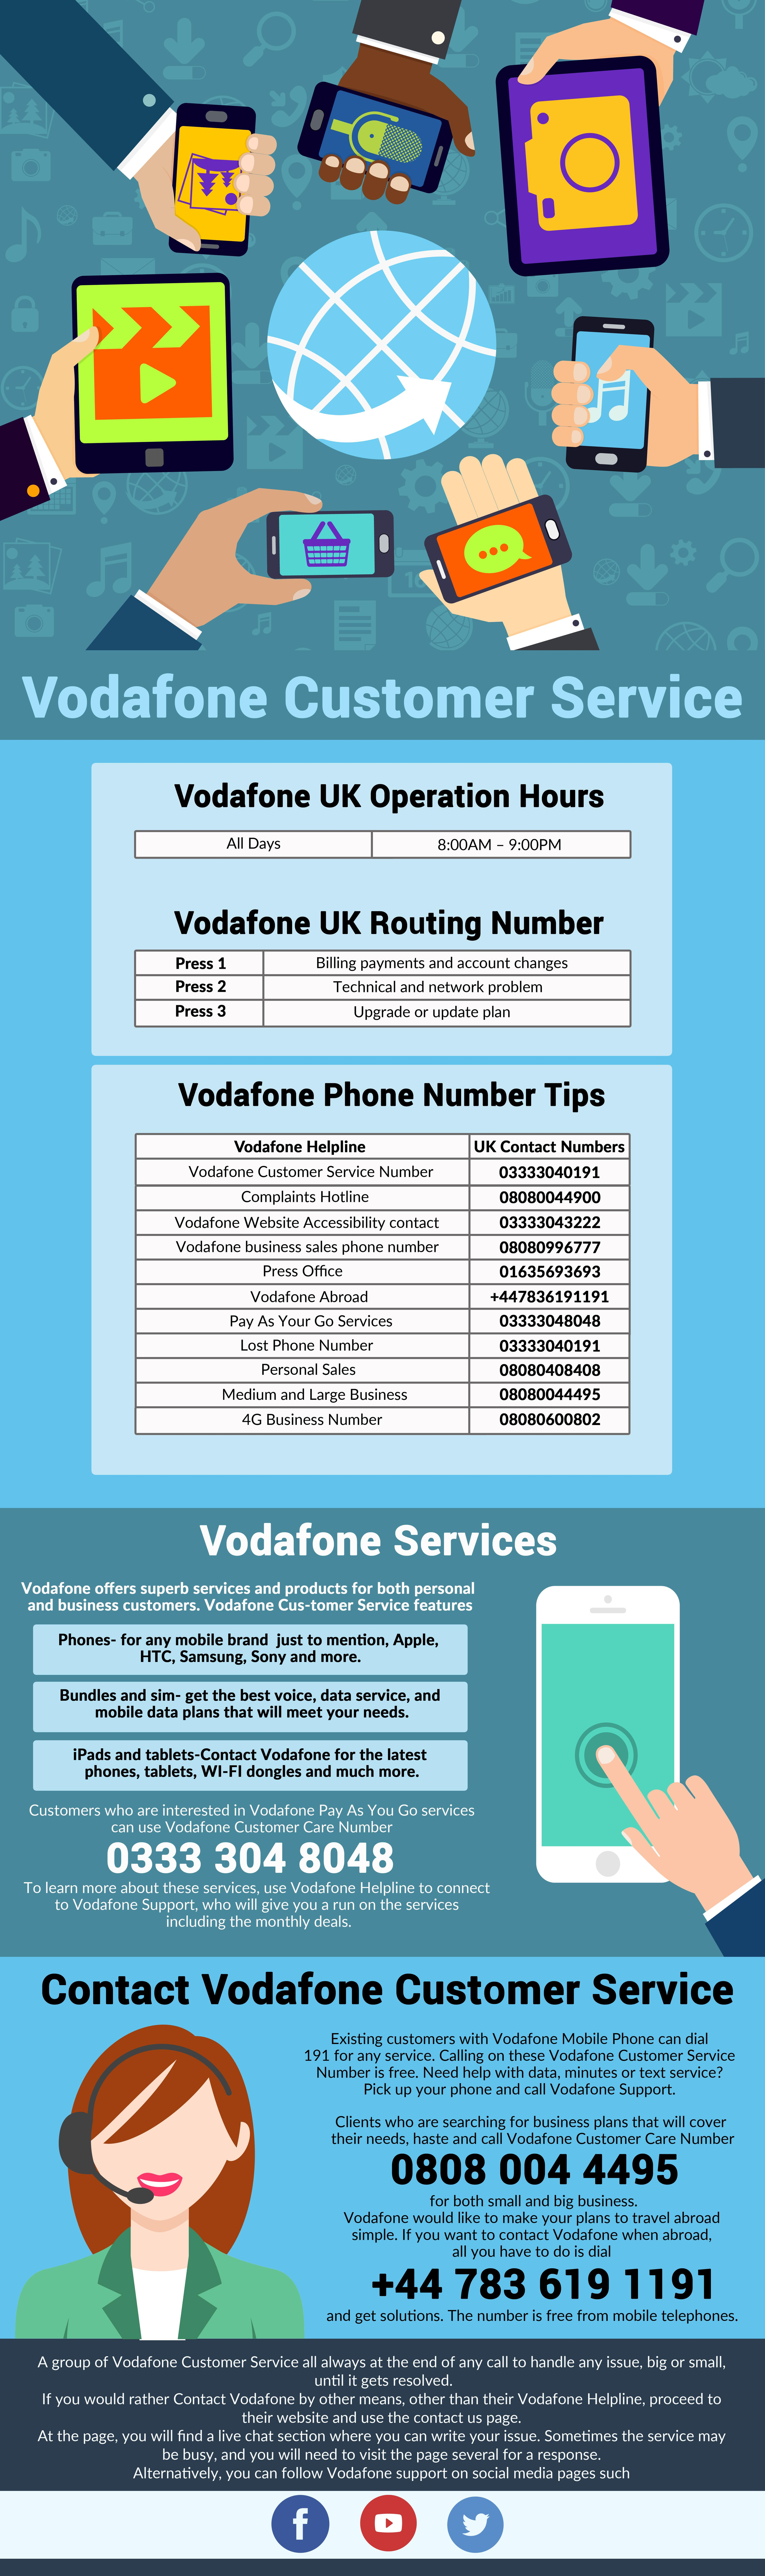 vodafone uk customer service free phone number